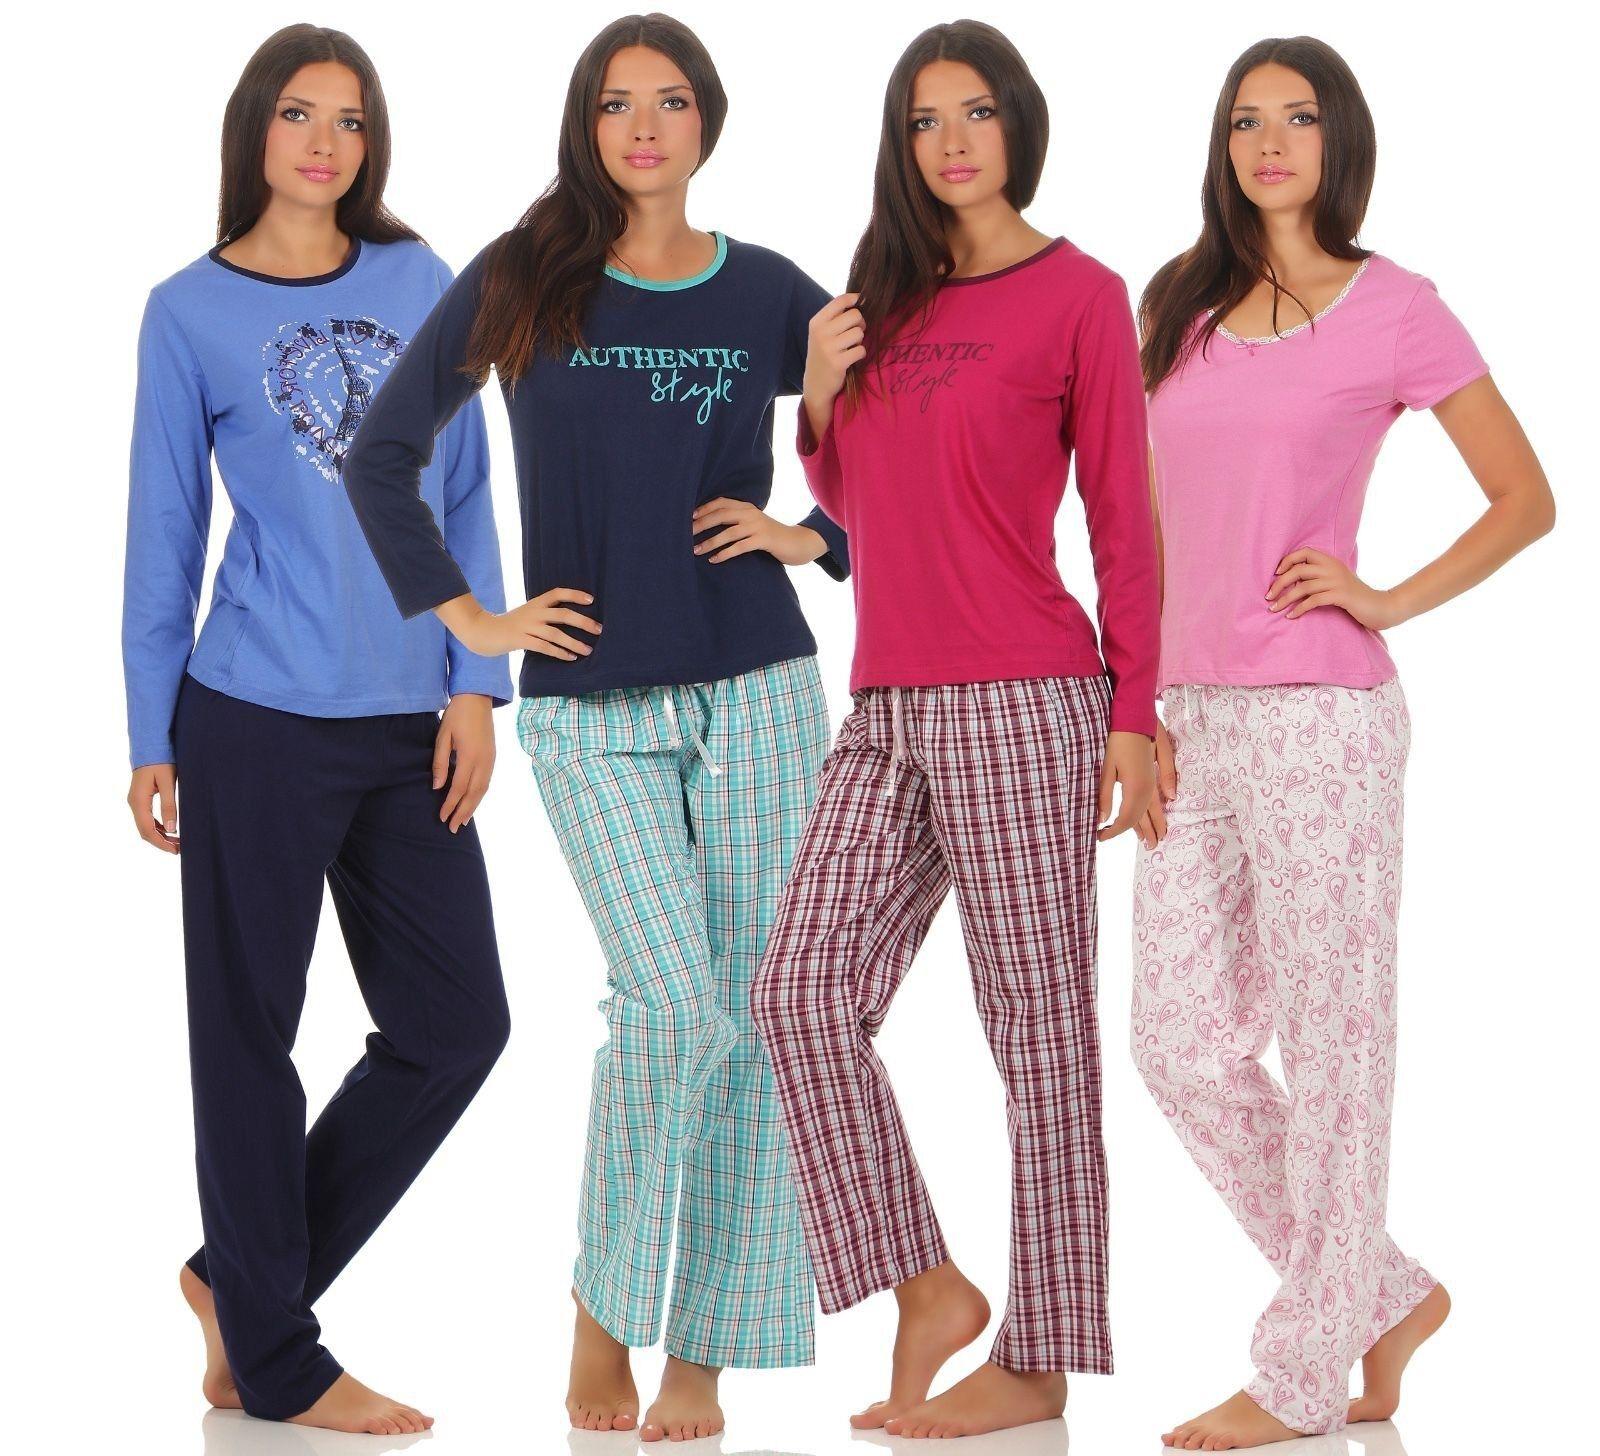 finest selection 908de b8f46 Damen Pyjama Lang Warm Test Vergleich +++ Damen Pyjama Lang ...